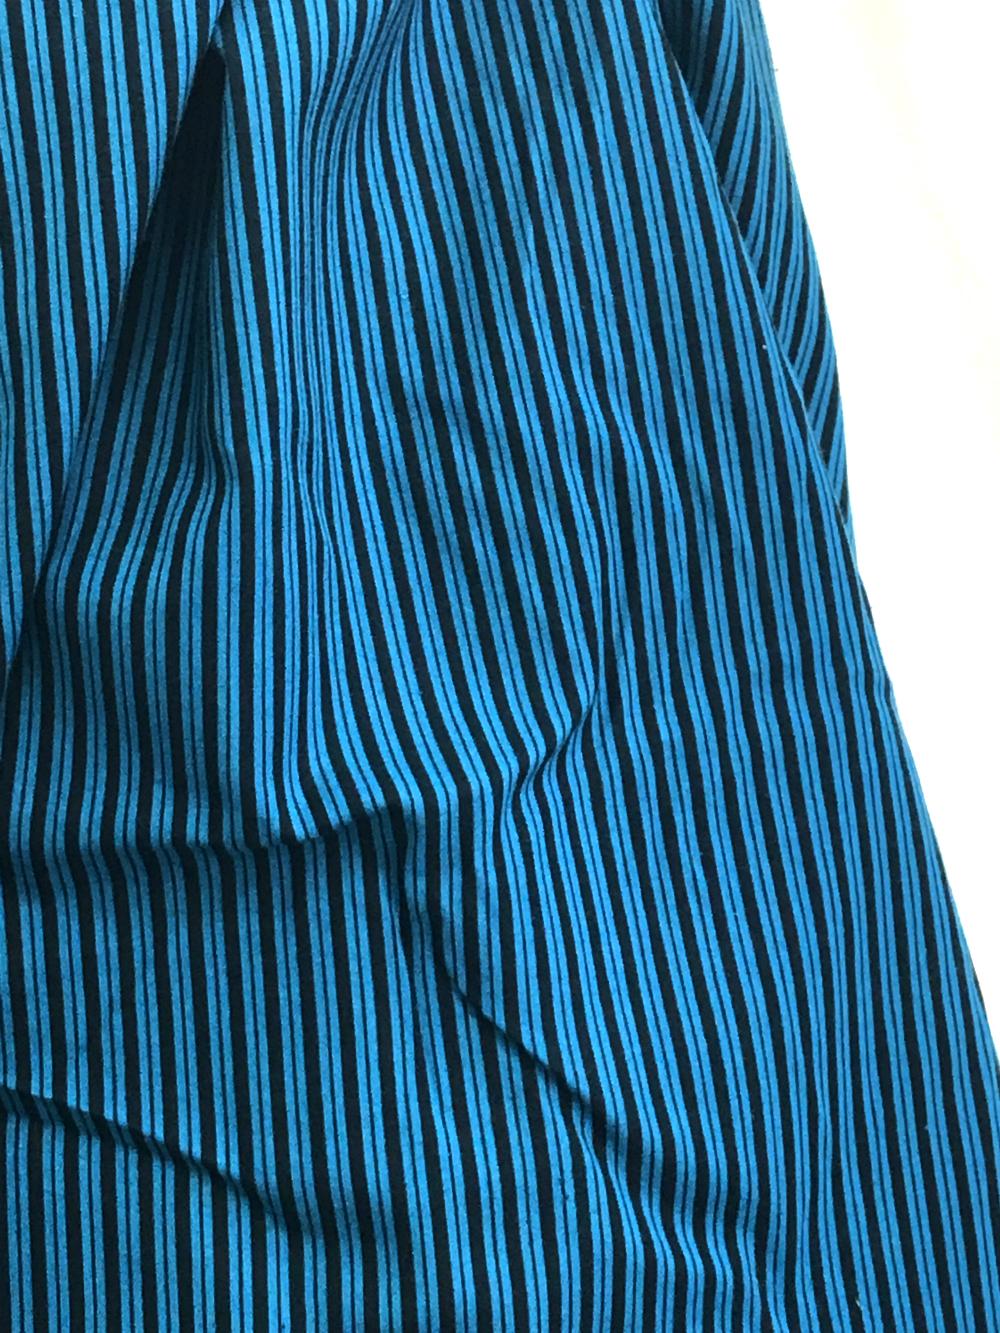 blue and black stripe cotton